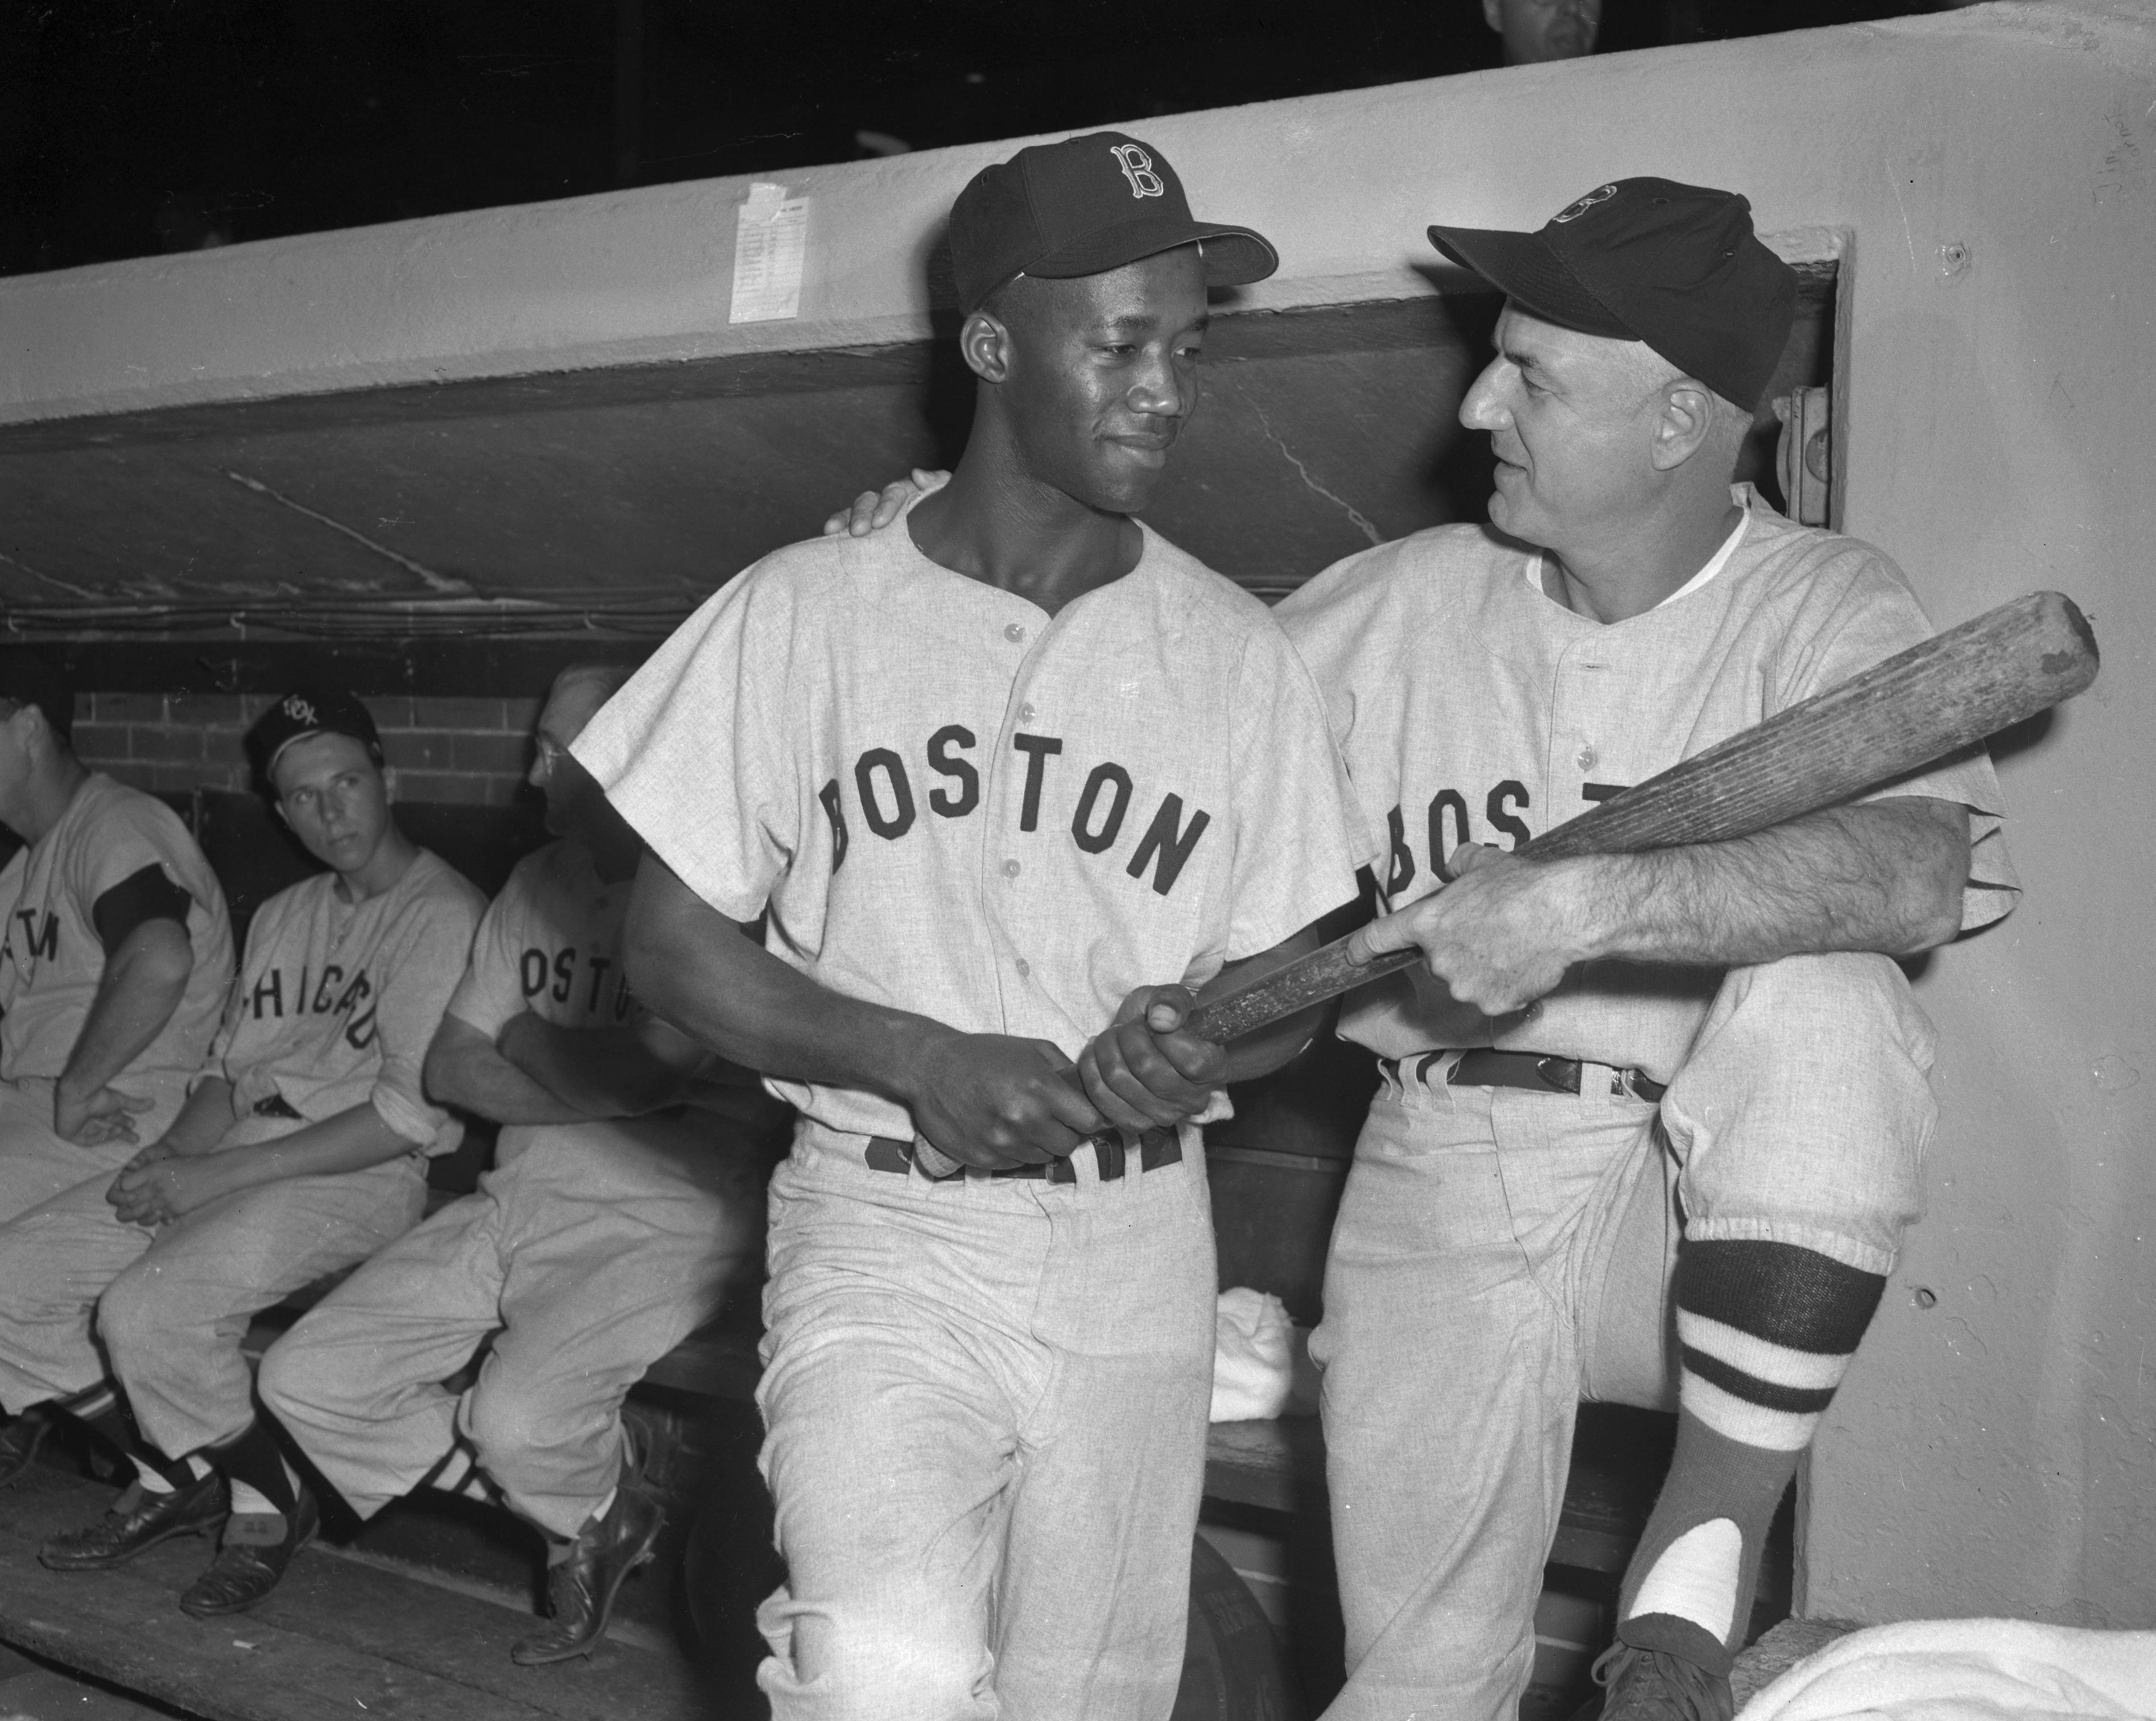 Bill Jurges and Pumpsie Green Holding Baseball Bat